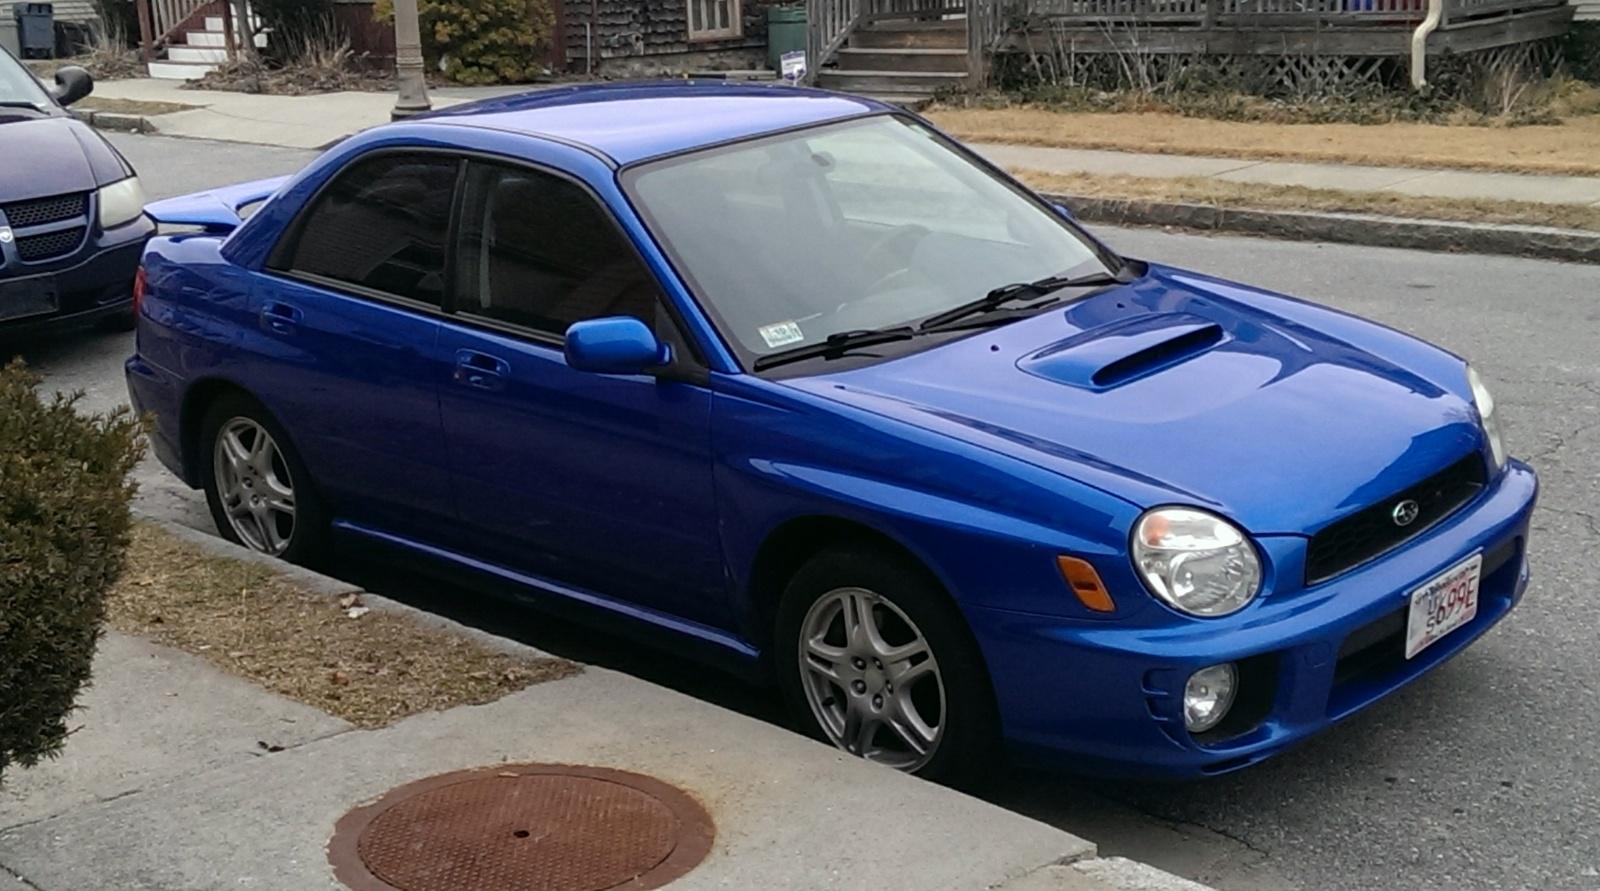 Who Owns Subaru >> 2002 Subaru Impreza WRX - Pictures - CarGurus